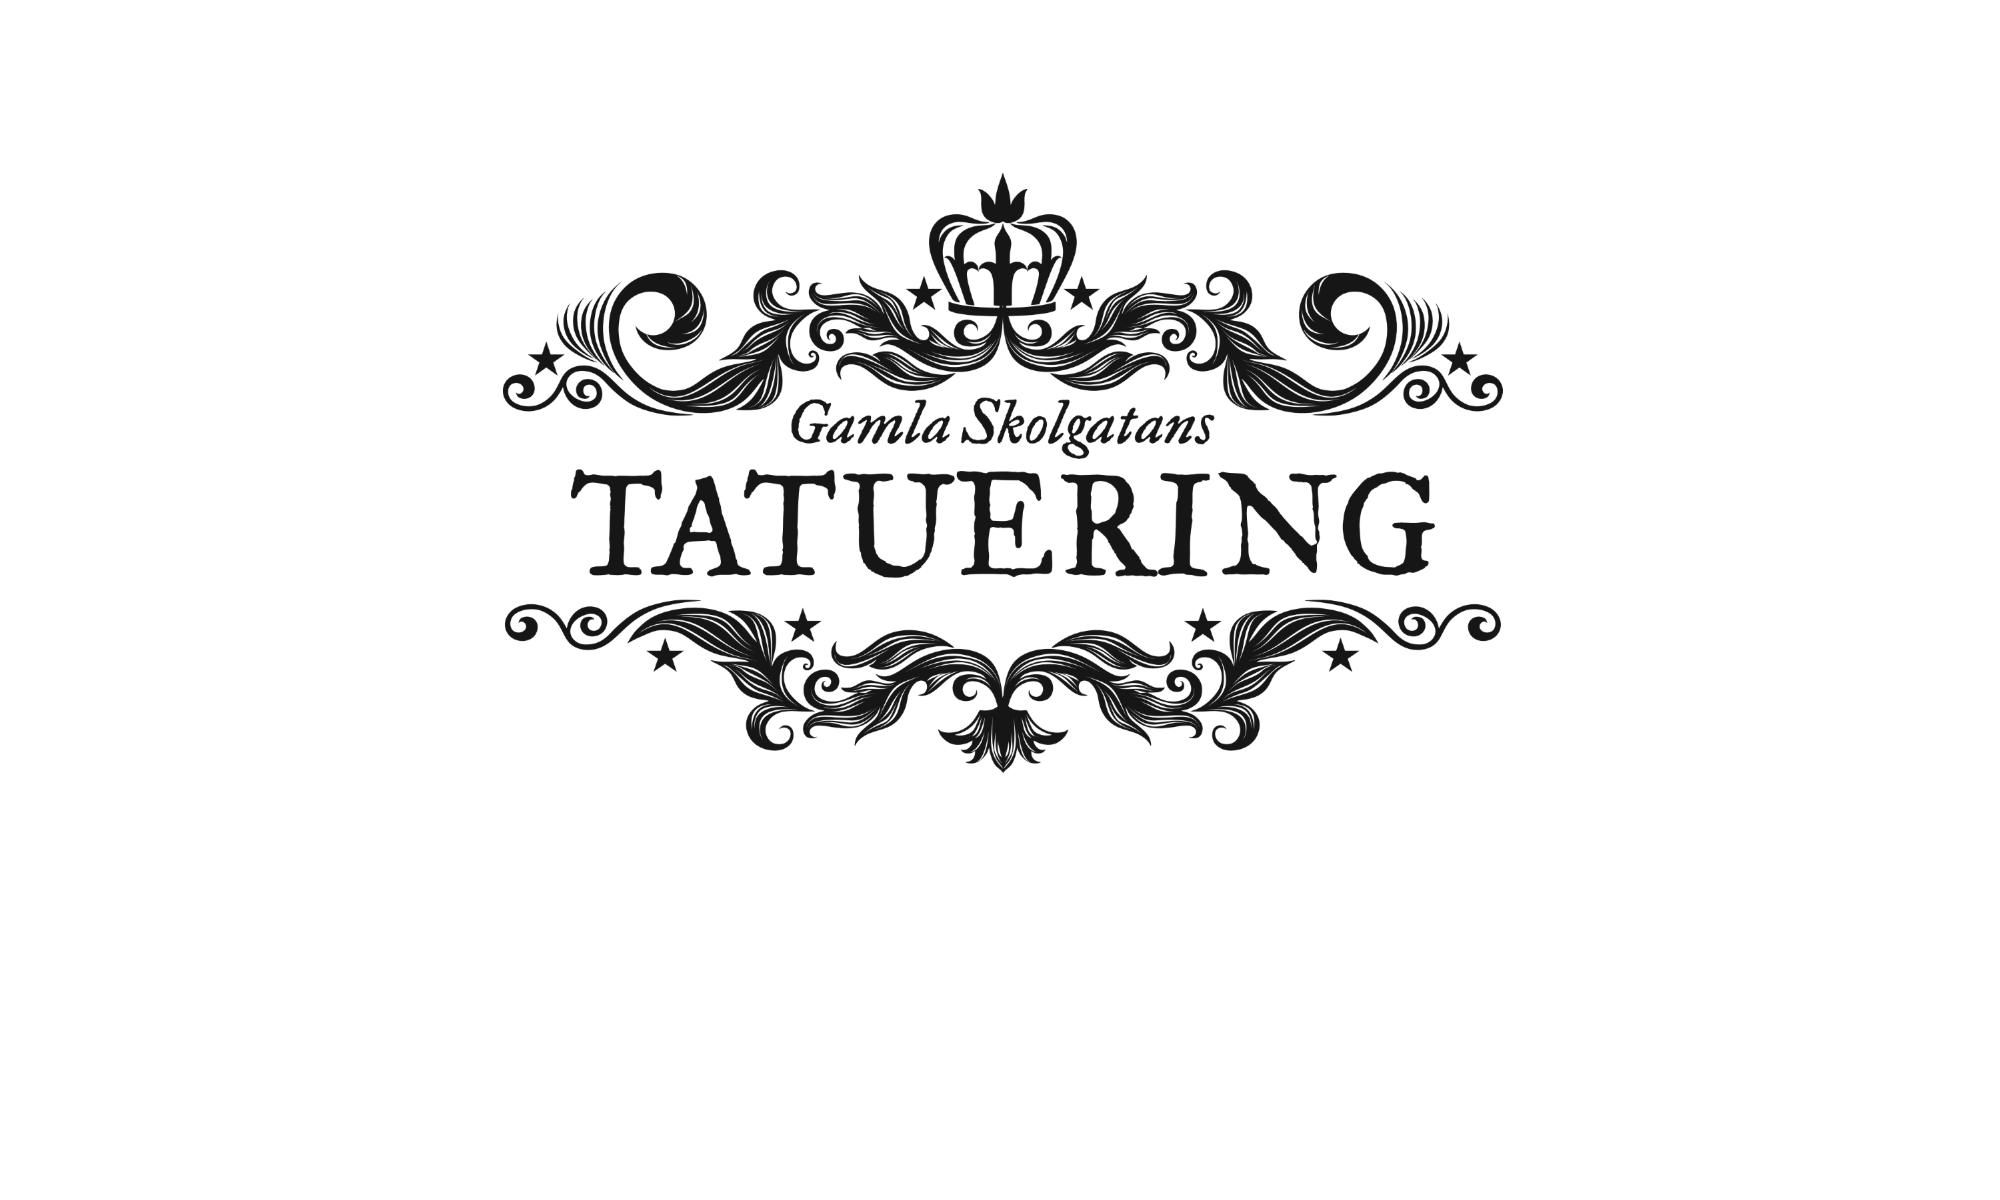 Gamla Skolgatans Tatuering